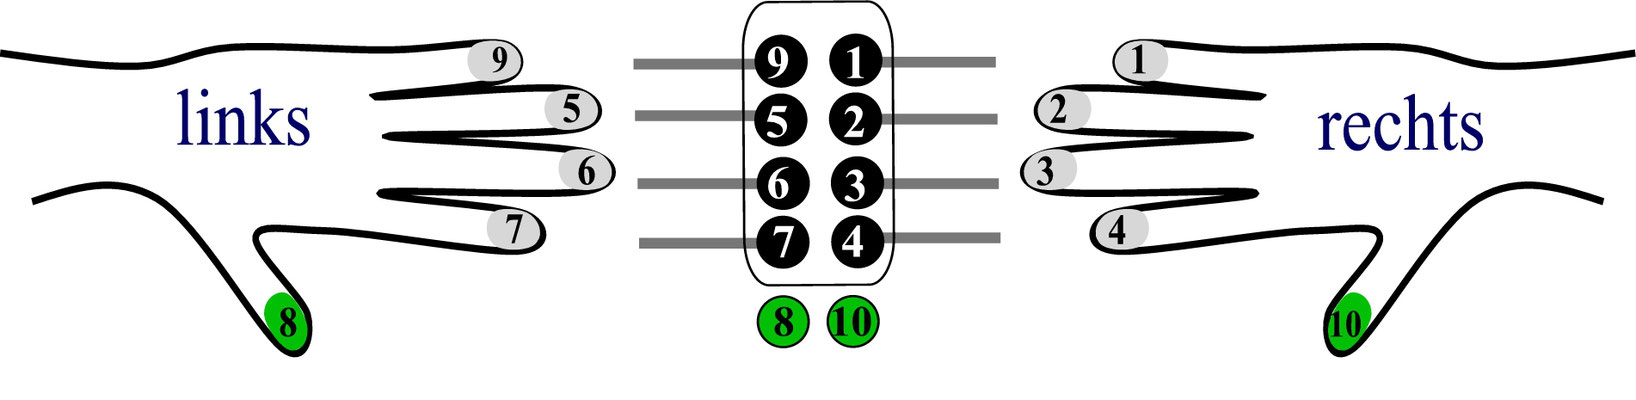 10-Loch-System, italienisch Fingerfolge